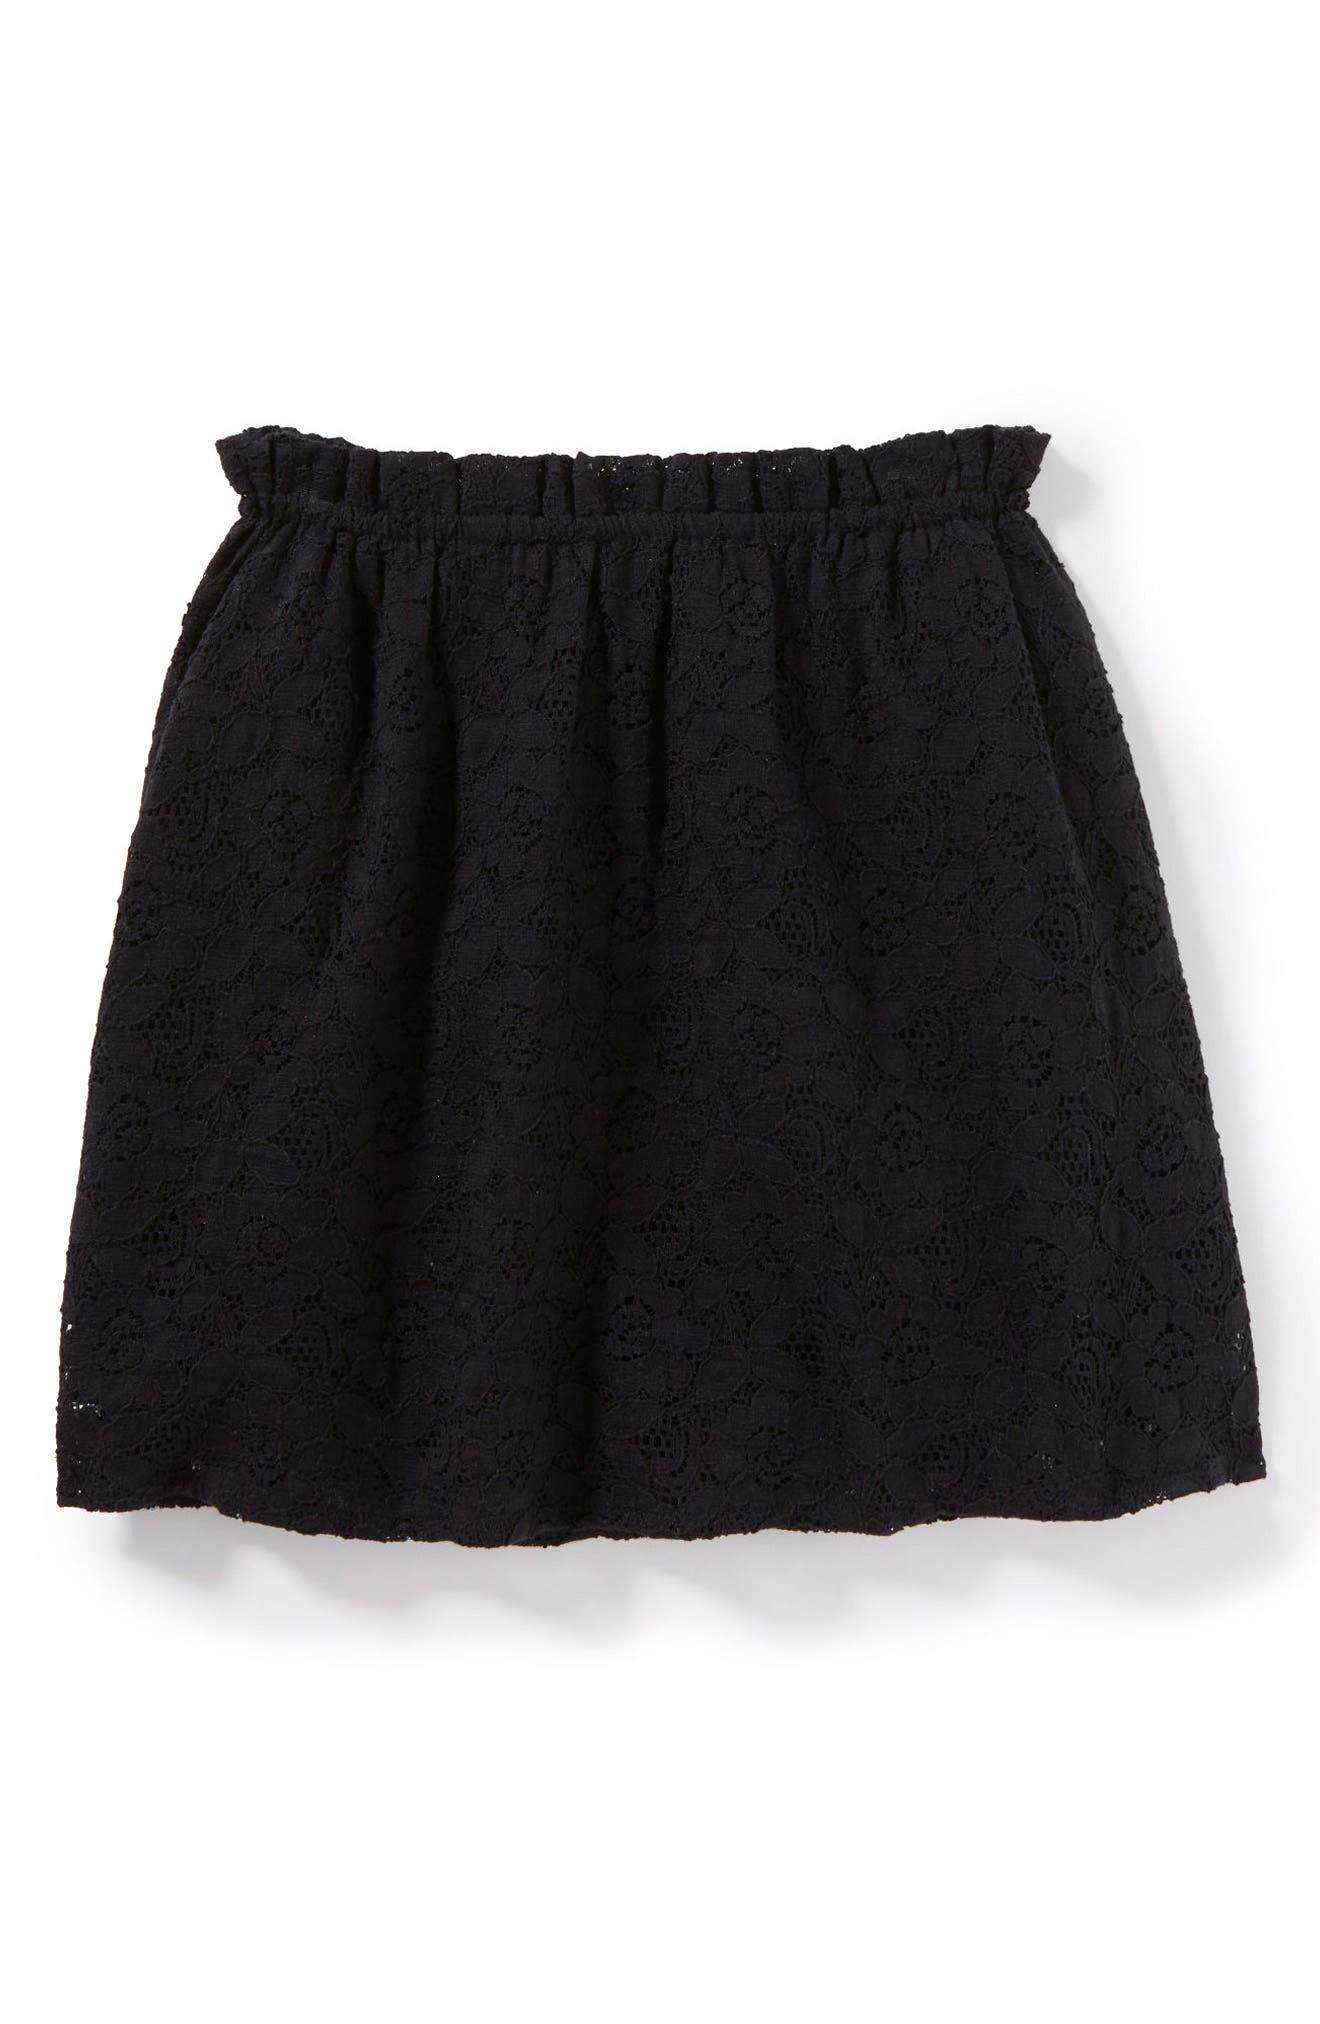 Alternate Image 1 Selected - Peek Renee Lace Skirt (Toddler Girls, Little Girls & Big Girls)